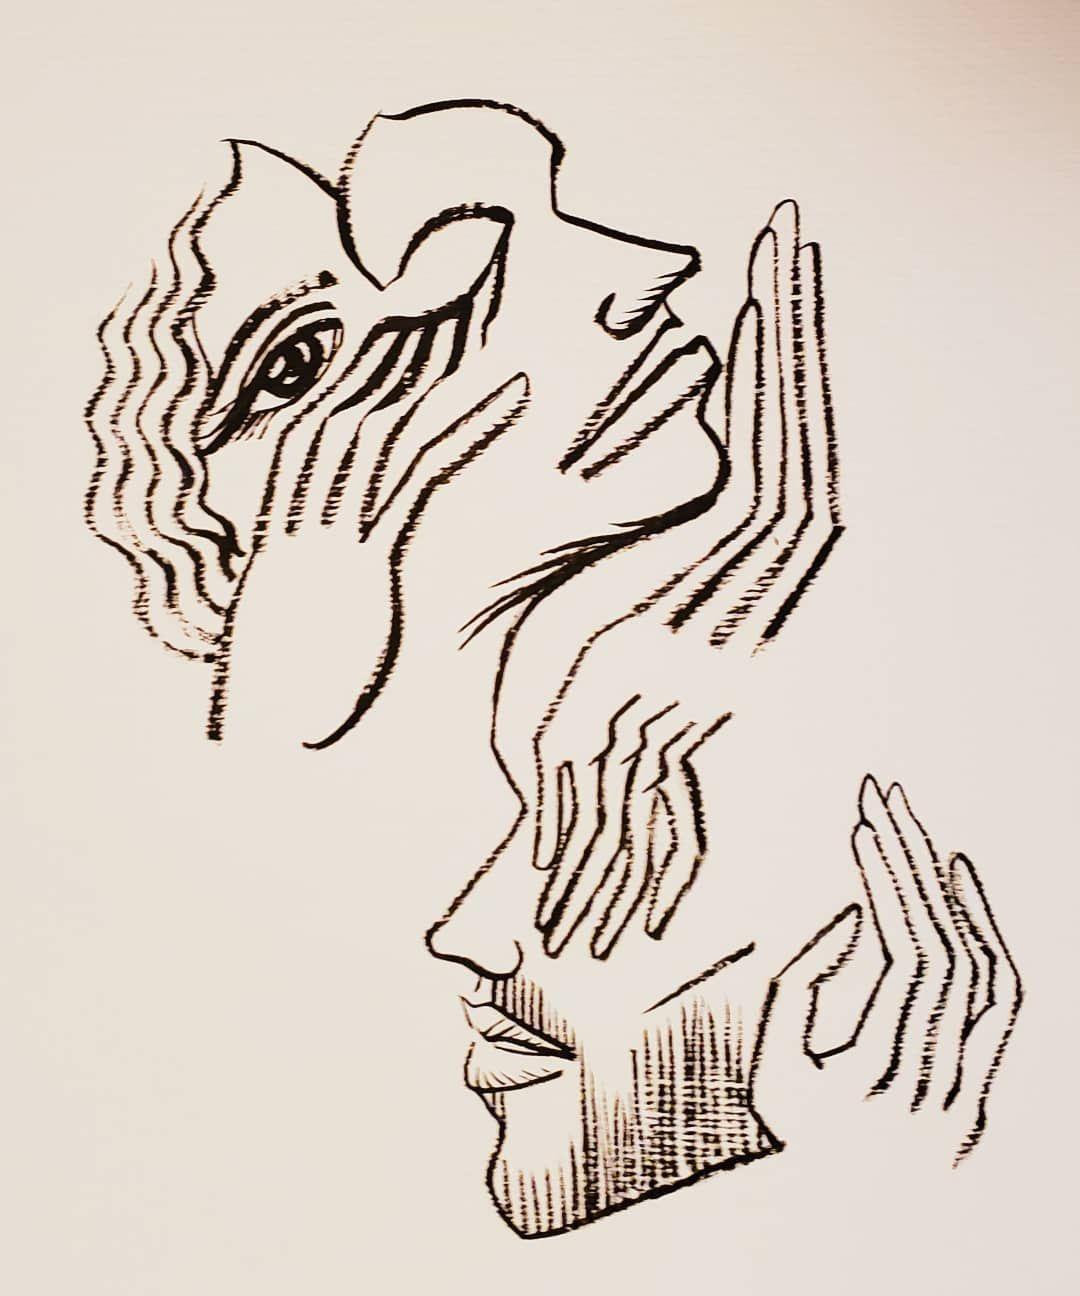 Untitled ink on paper  #spraypaint #beautiful #instagood #artist #basquiat #painter #brooklyn #nyc #florida #puertorico #ink #oilpainting #graffiti #streetart #arts #fineart #latino #latinx #hispanic #amor #artsy #drawing #painting #love #artlovers #artistsoninstagram #brownisbeautiful #iloveyou #god #inspired